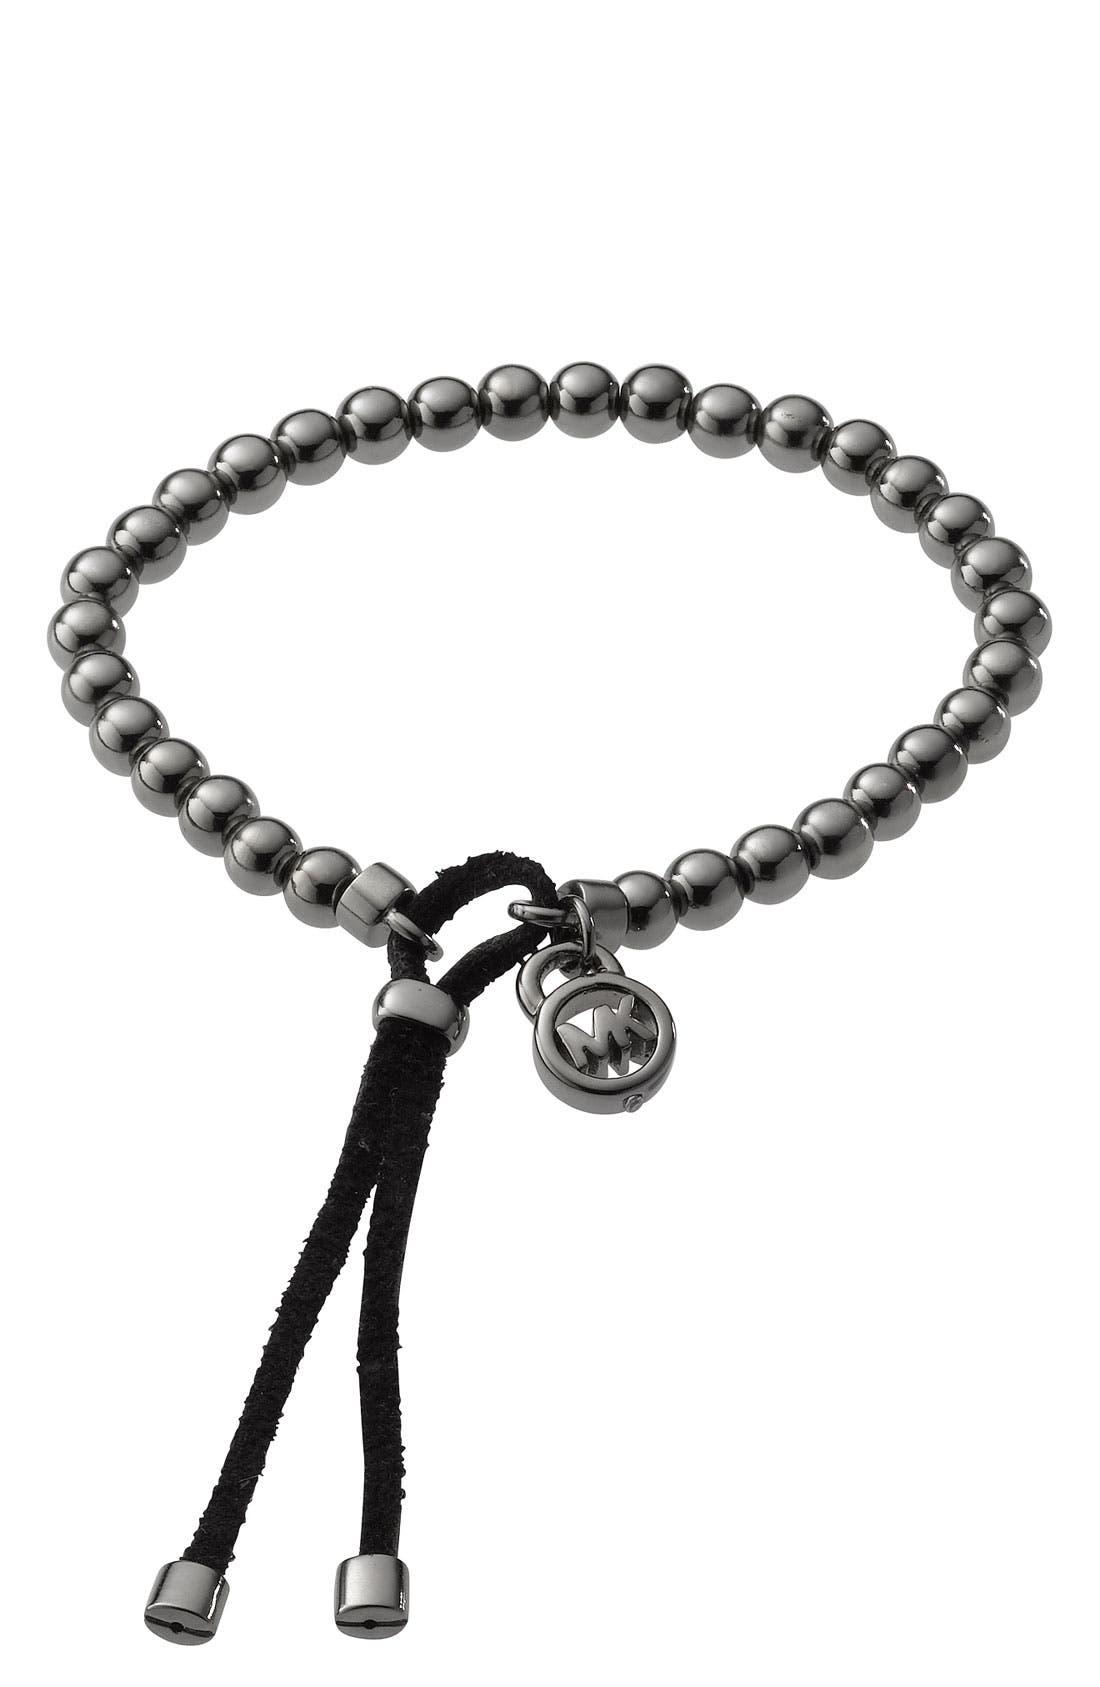 Michael Kors Beaded Stretch Bracelet,                             Main thumbnail 1, color,                             001